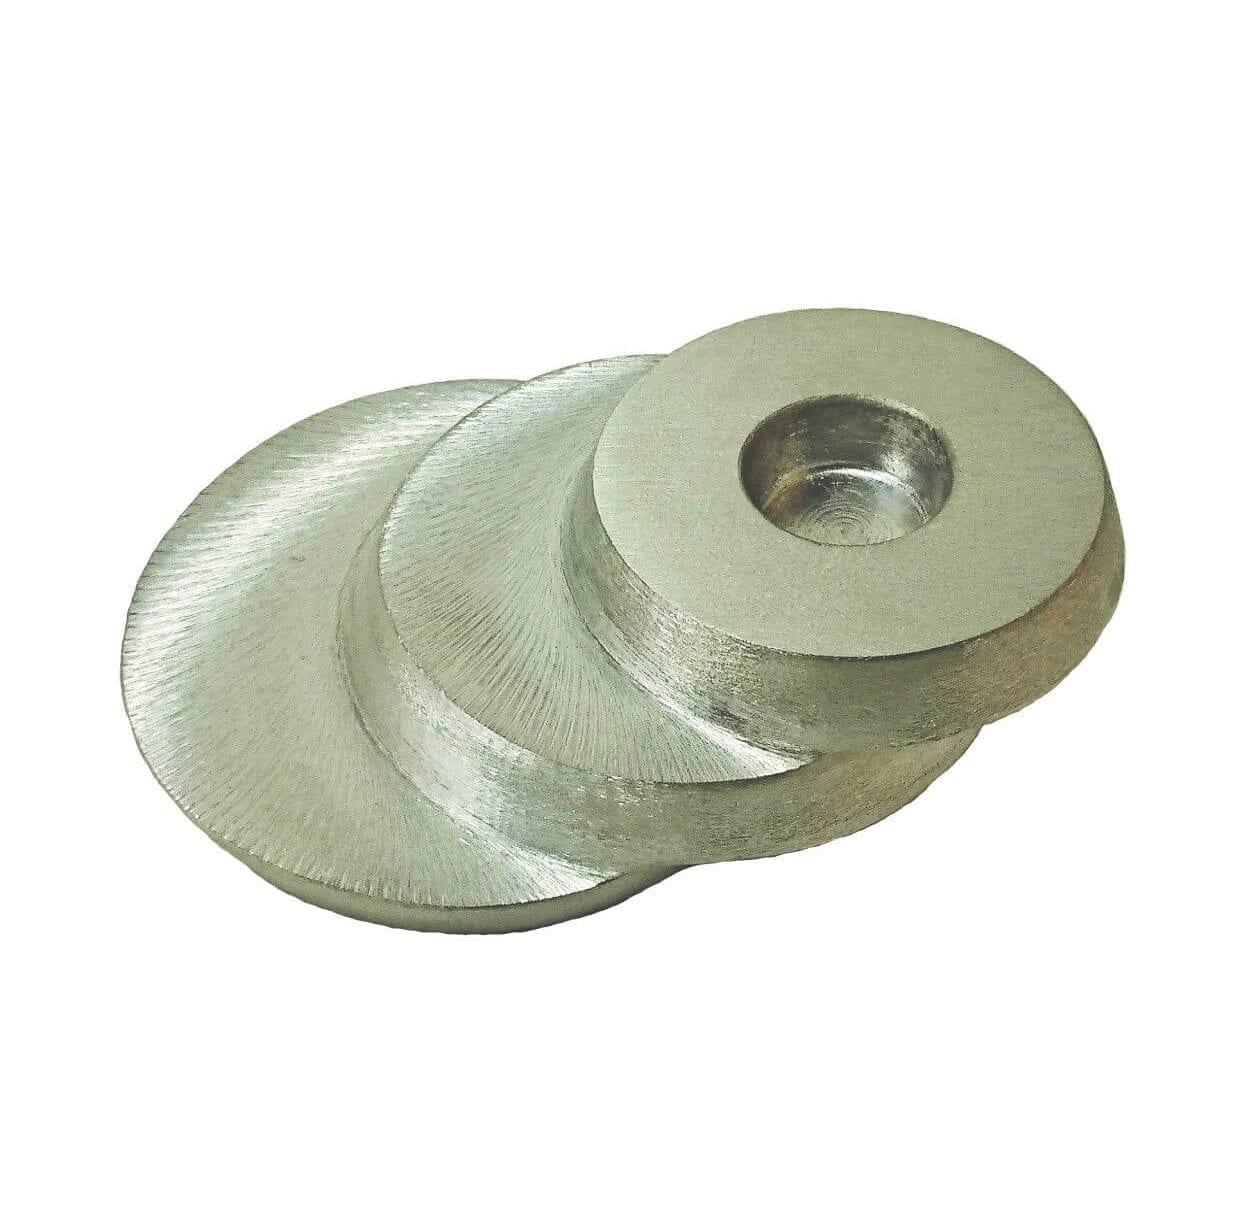 stack-candle-holder-side-top-handmade-metal